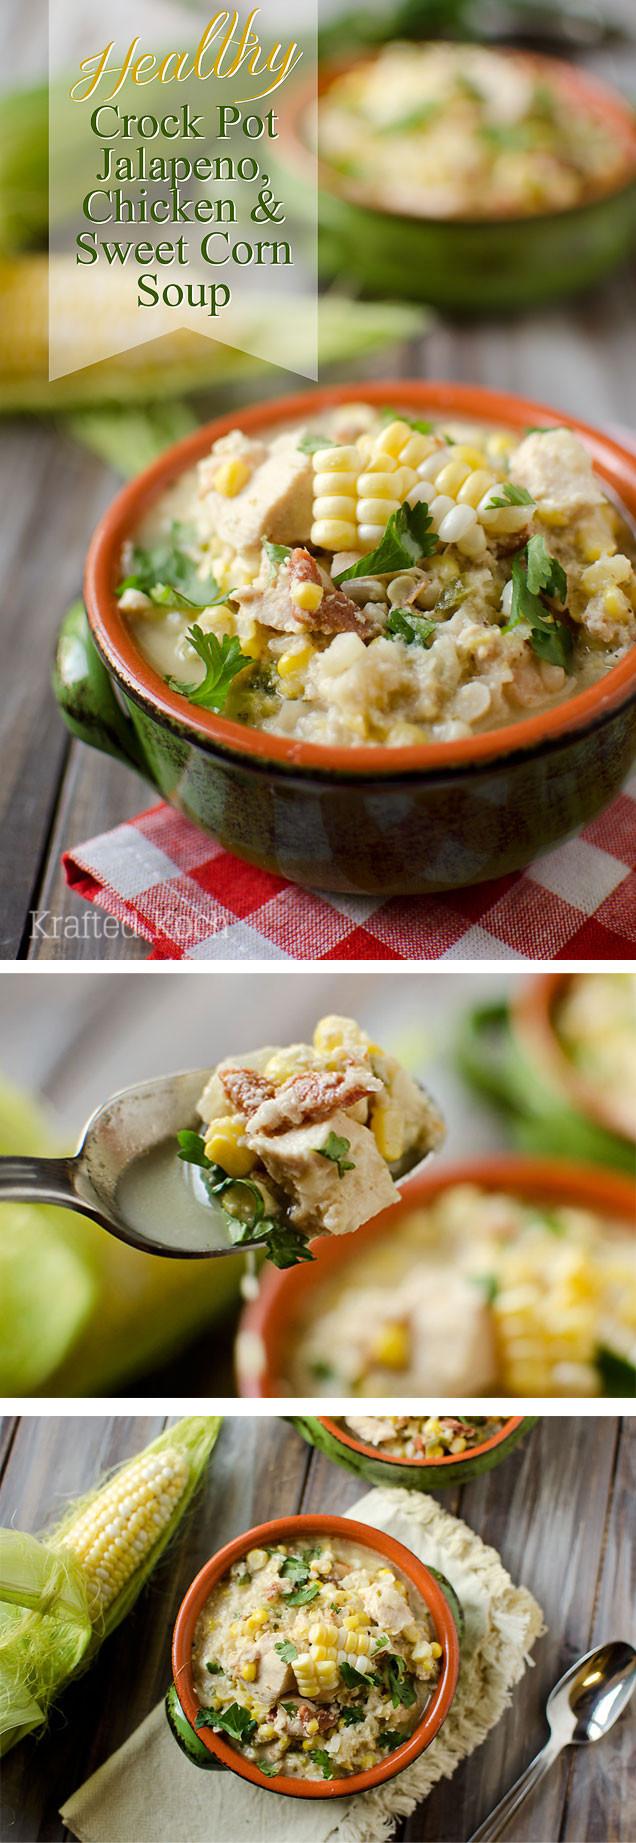 Healthy Crock Pot Dinners  Healthy Crock Pot Jalapeno Chicken & Sweet Corn Soup